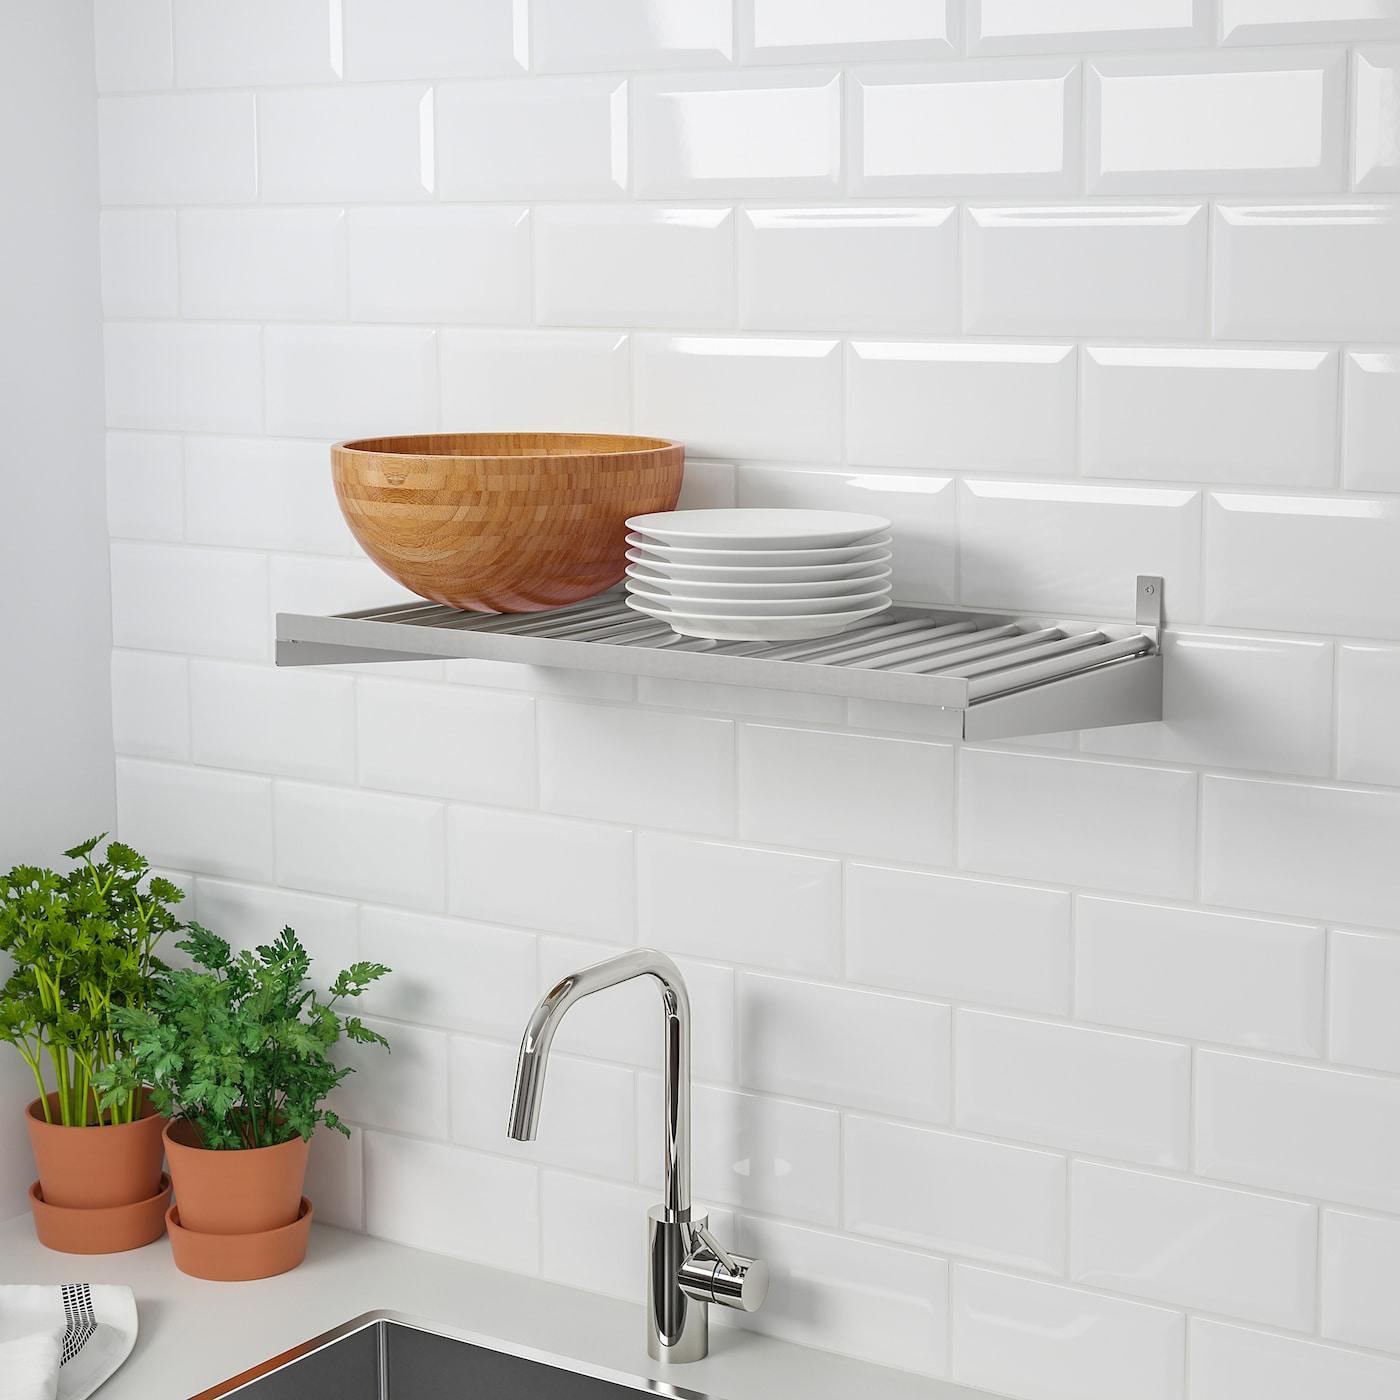 KUNGSFORS Shelf - stainless steel 3 cm